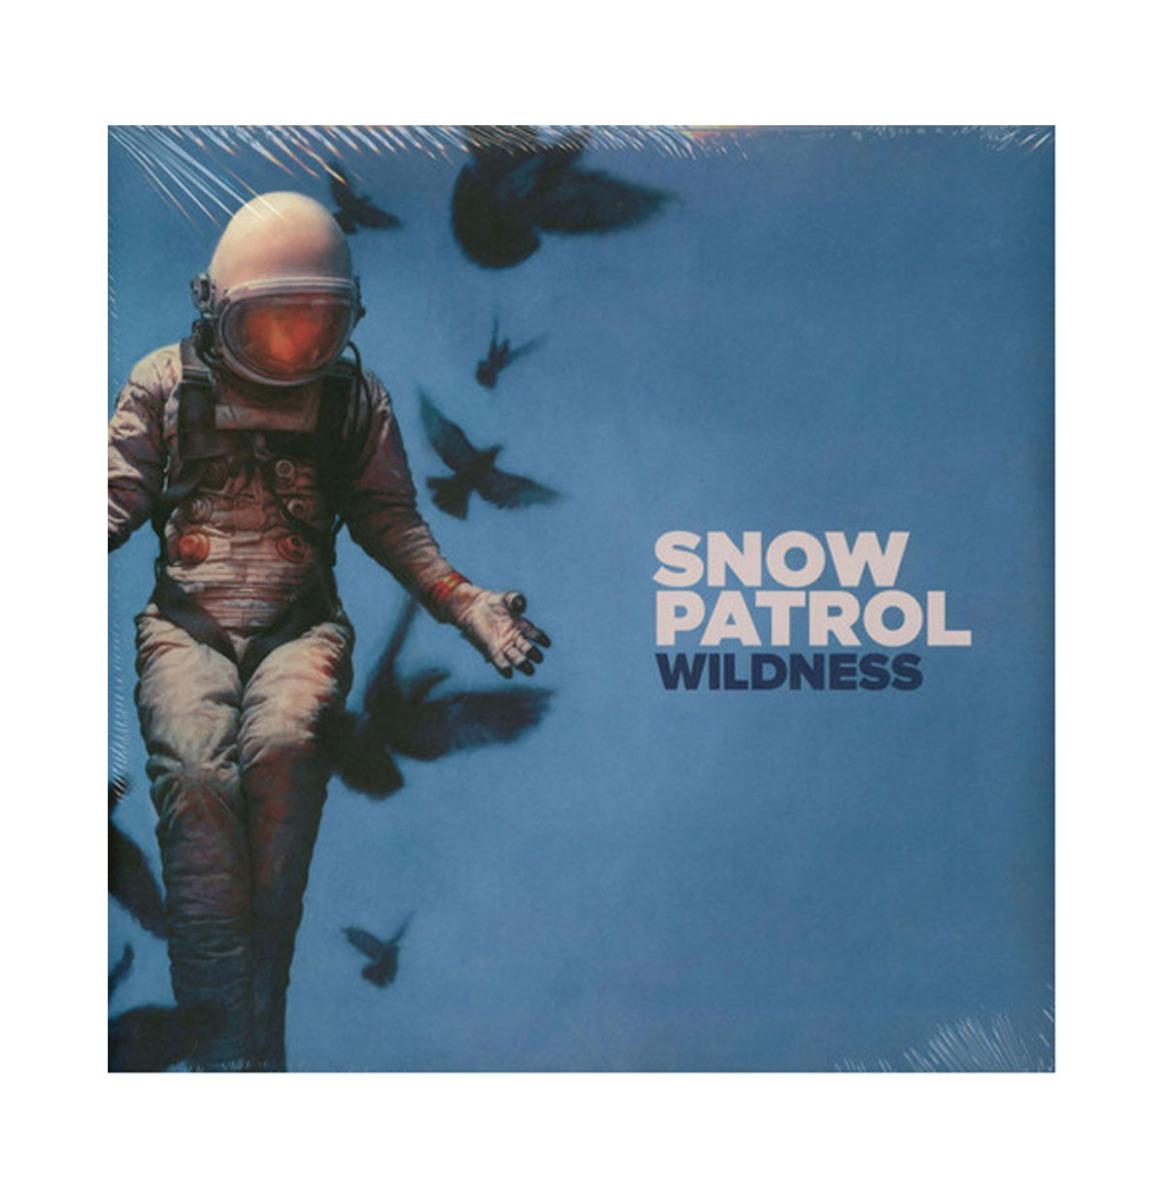 Snow Patrol - Wildness 2 LP Deluxe Edition